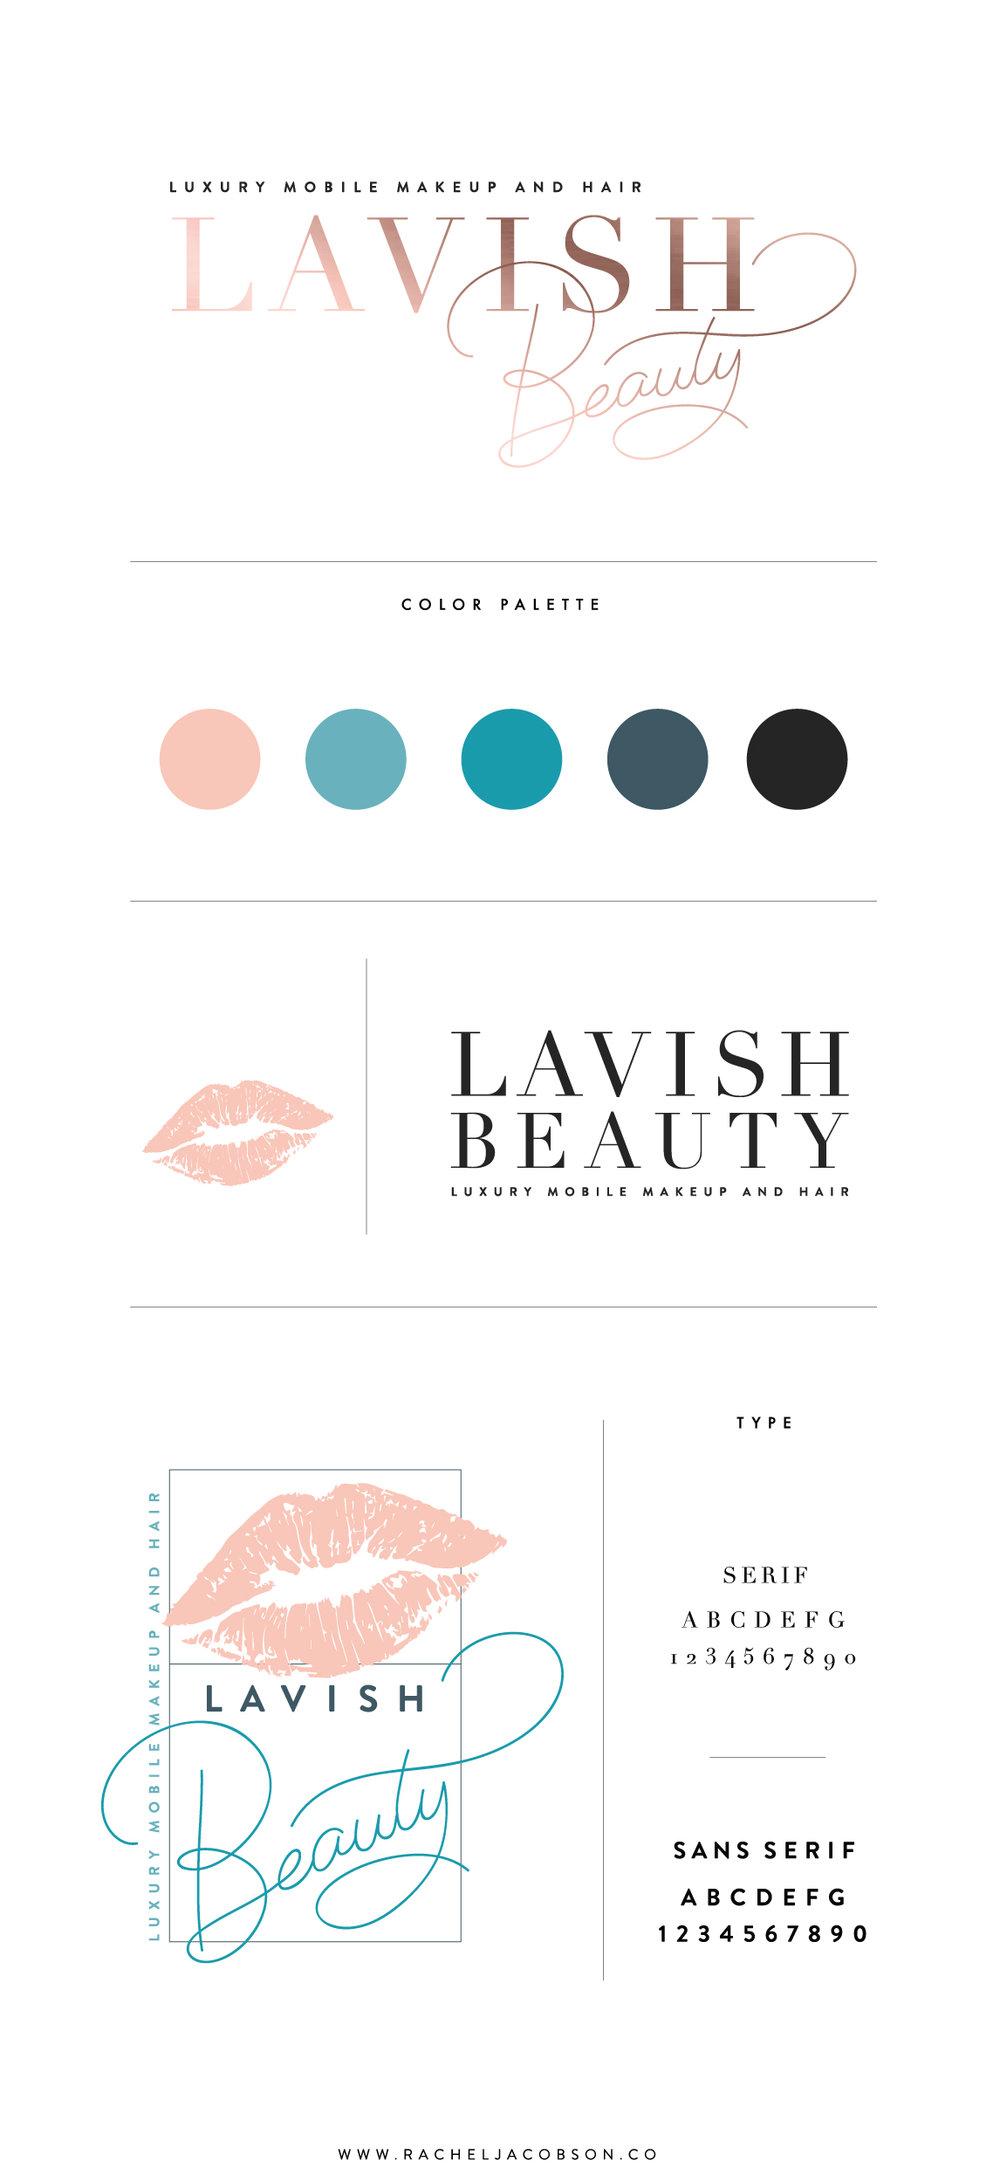 Lavish Beauty Logo Design Brand Mockup-01.jpg